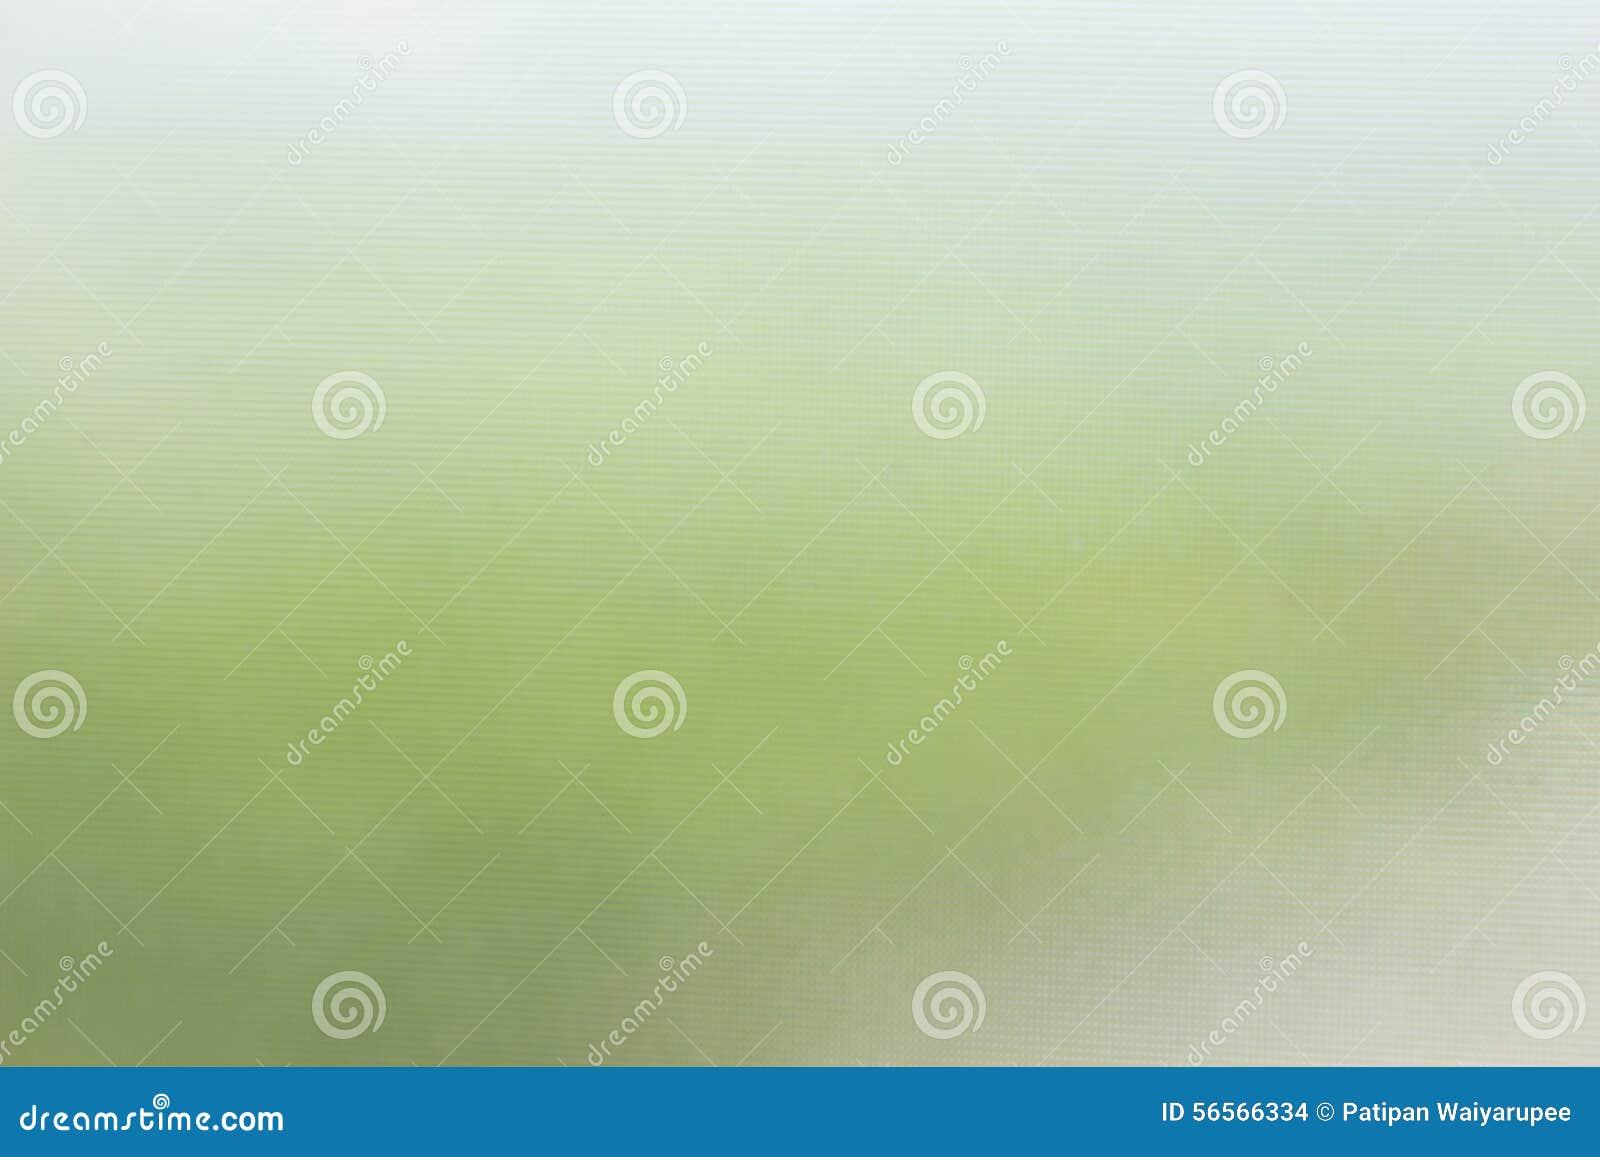 Download Πράσινο αφηρημένο υπόβαθρο θαμπάδων Στοκ Εικόνες - εικόνα από μαγικός, ανασκόπησης: 56566334